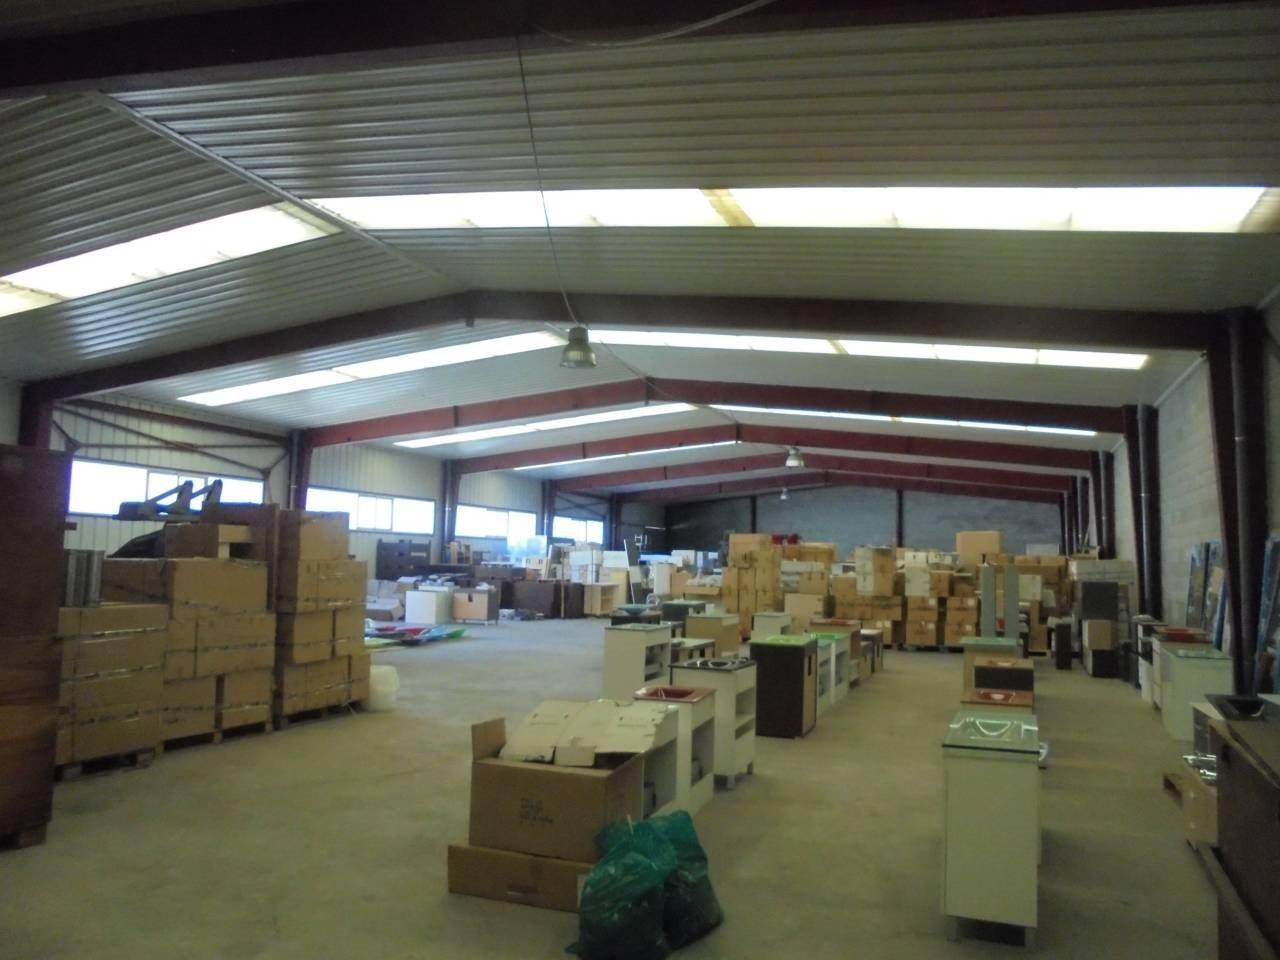 Miete Fabrikhalle  Sant joan d en coll. Nave-almacen de 6000m2, repartidos en 2 planta con 3000m2 en cad